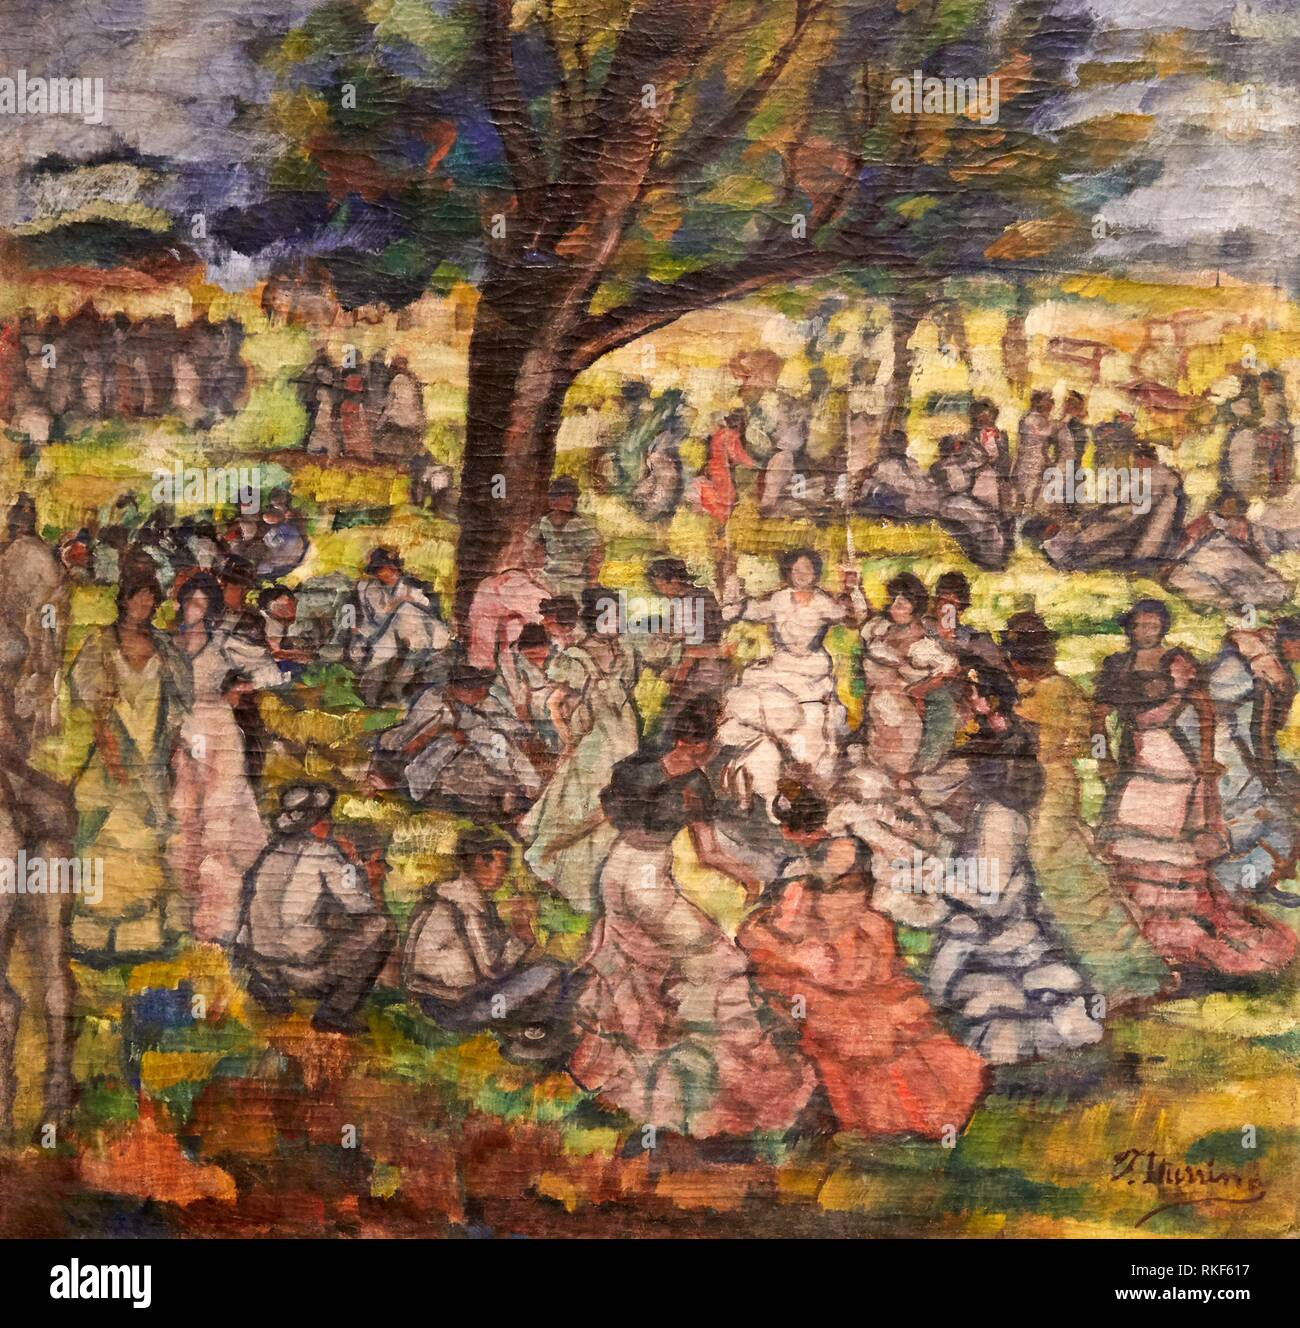 '''Une journée dans le pays'', c. 1905-1911, Francisco Iturrino, Musée National d'Art Catalan, Museu Nacional d'Art de Catalunya, MNAC, Barcelone, Photo Stock